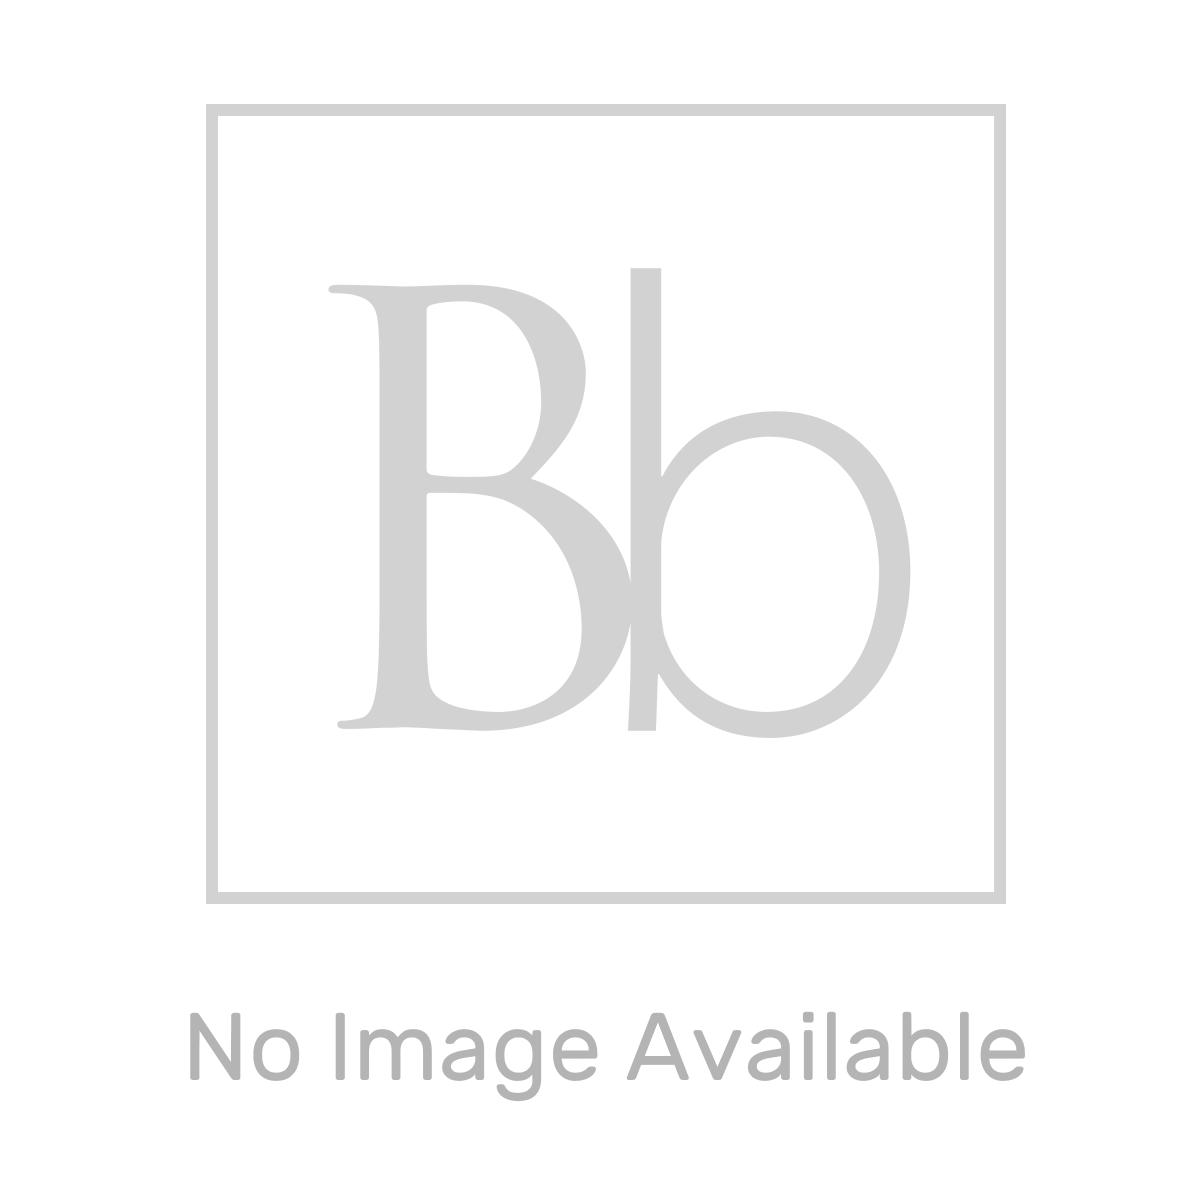 Aquadart Rolla 8 Sliding Shower Door with Optional Side Panel